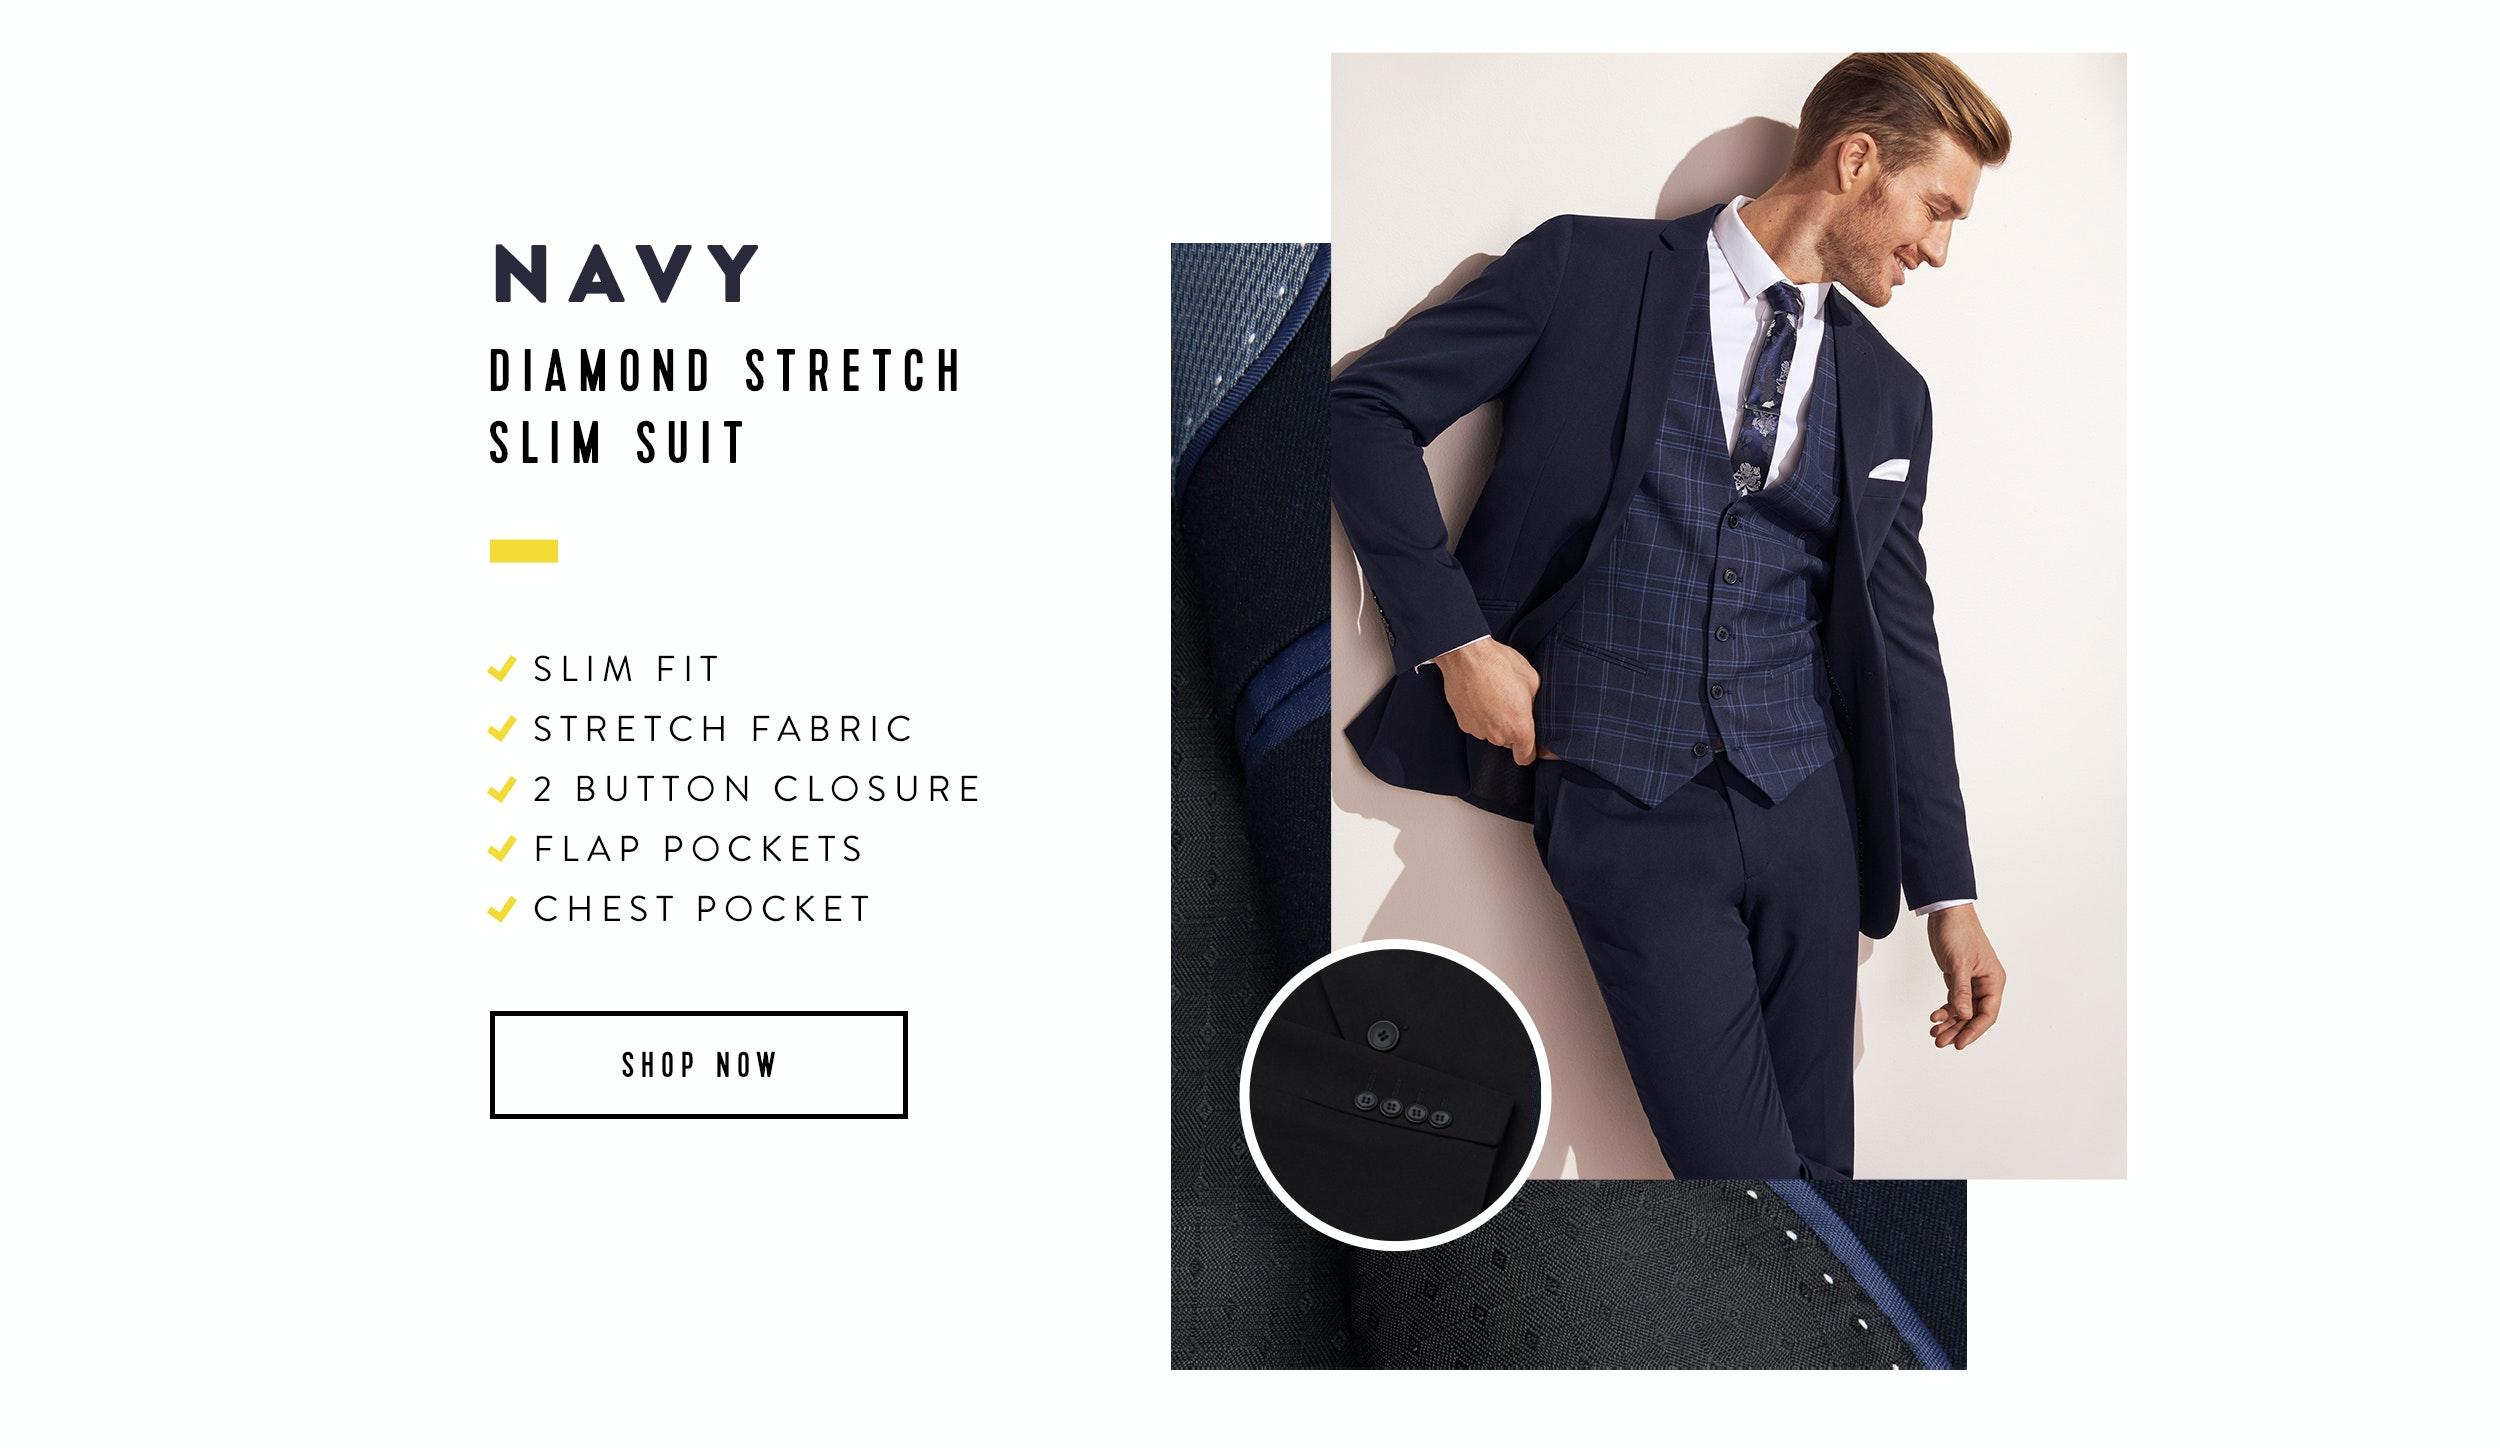 Shop The Diamond Stretch Skinny Slim Suit In Navy